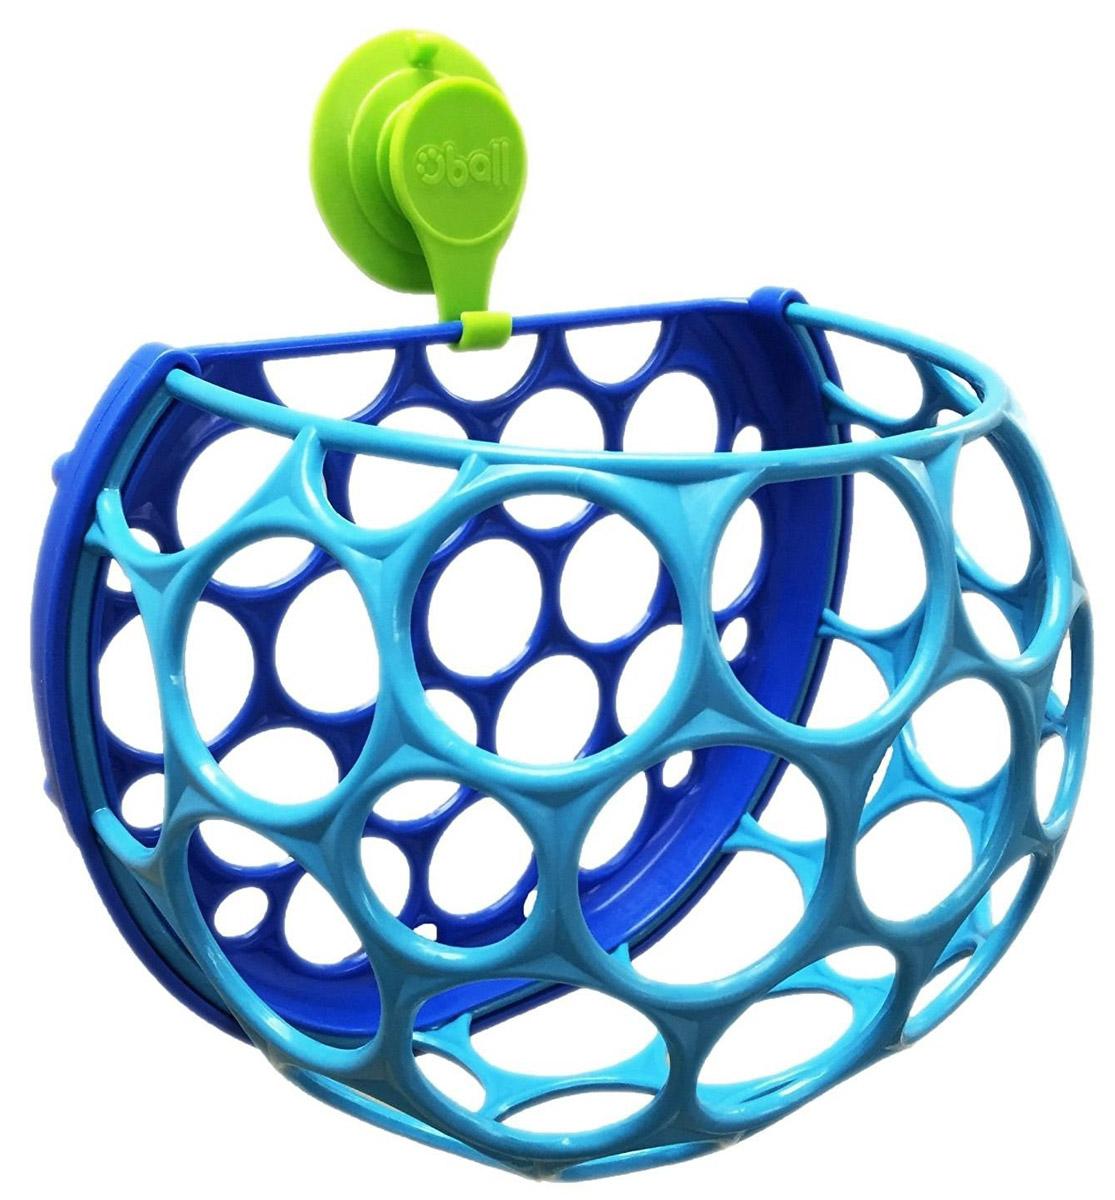 Oball Контейнер для игрушек в ванной контейнер для игрушек большой